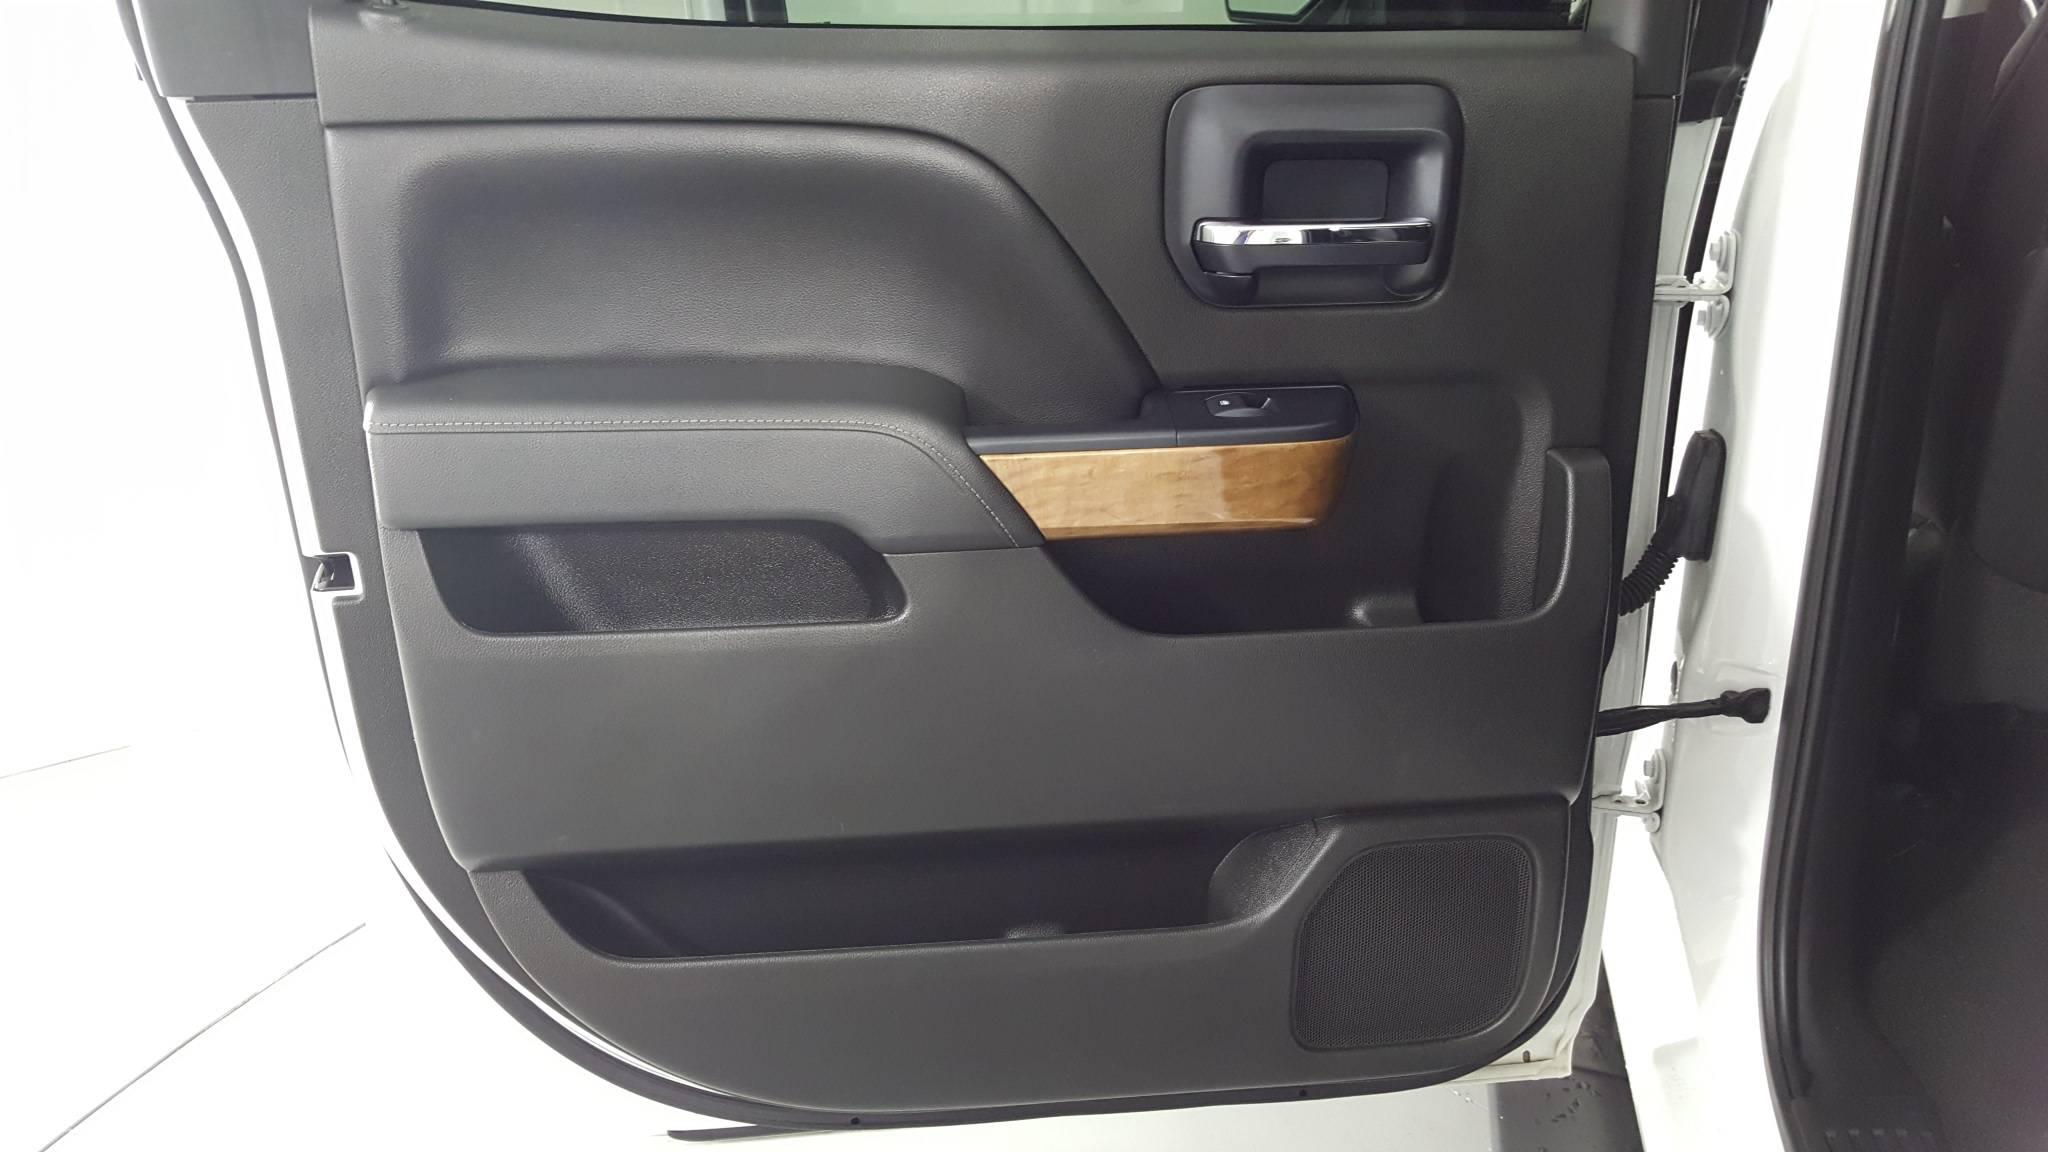 Pre-Owned 2014 Chevrolet Silverado 1500 LTZ